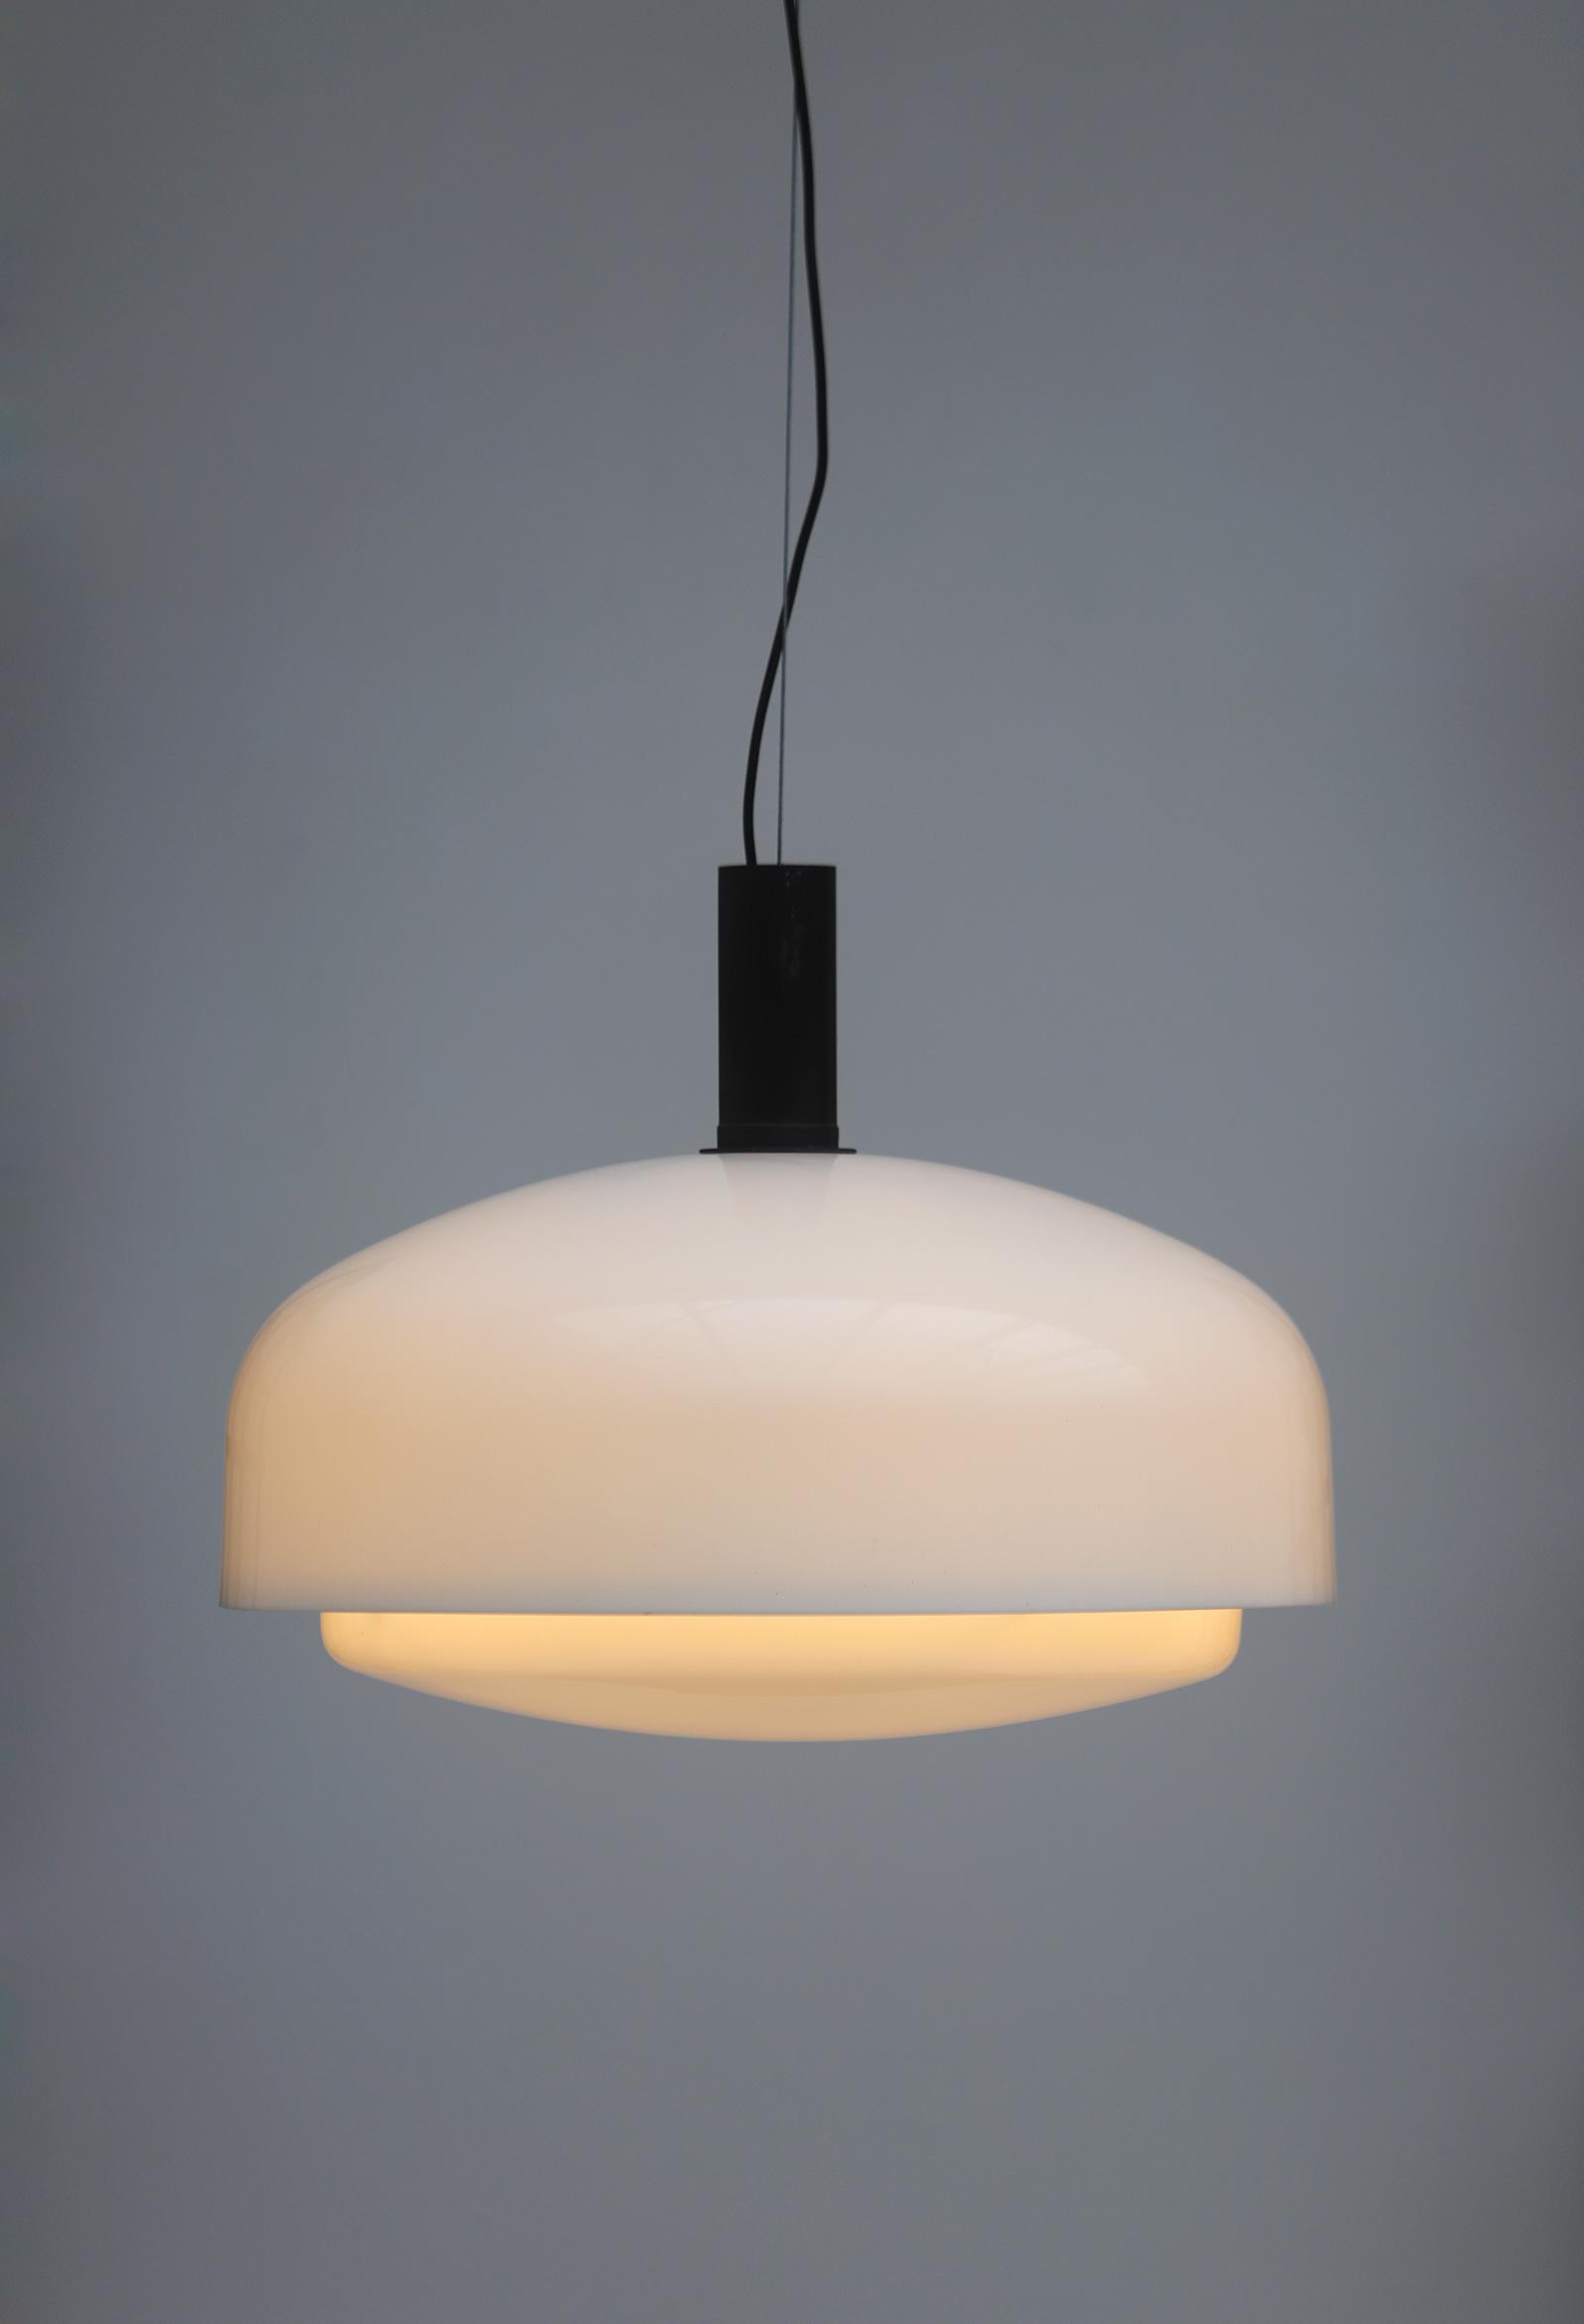 Eugenio Gentile Kartell kd62 Pendant Lamp image 3